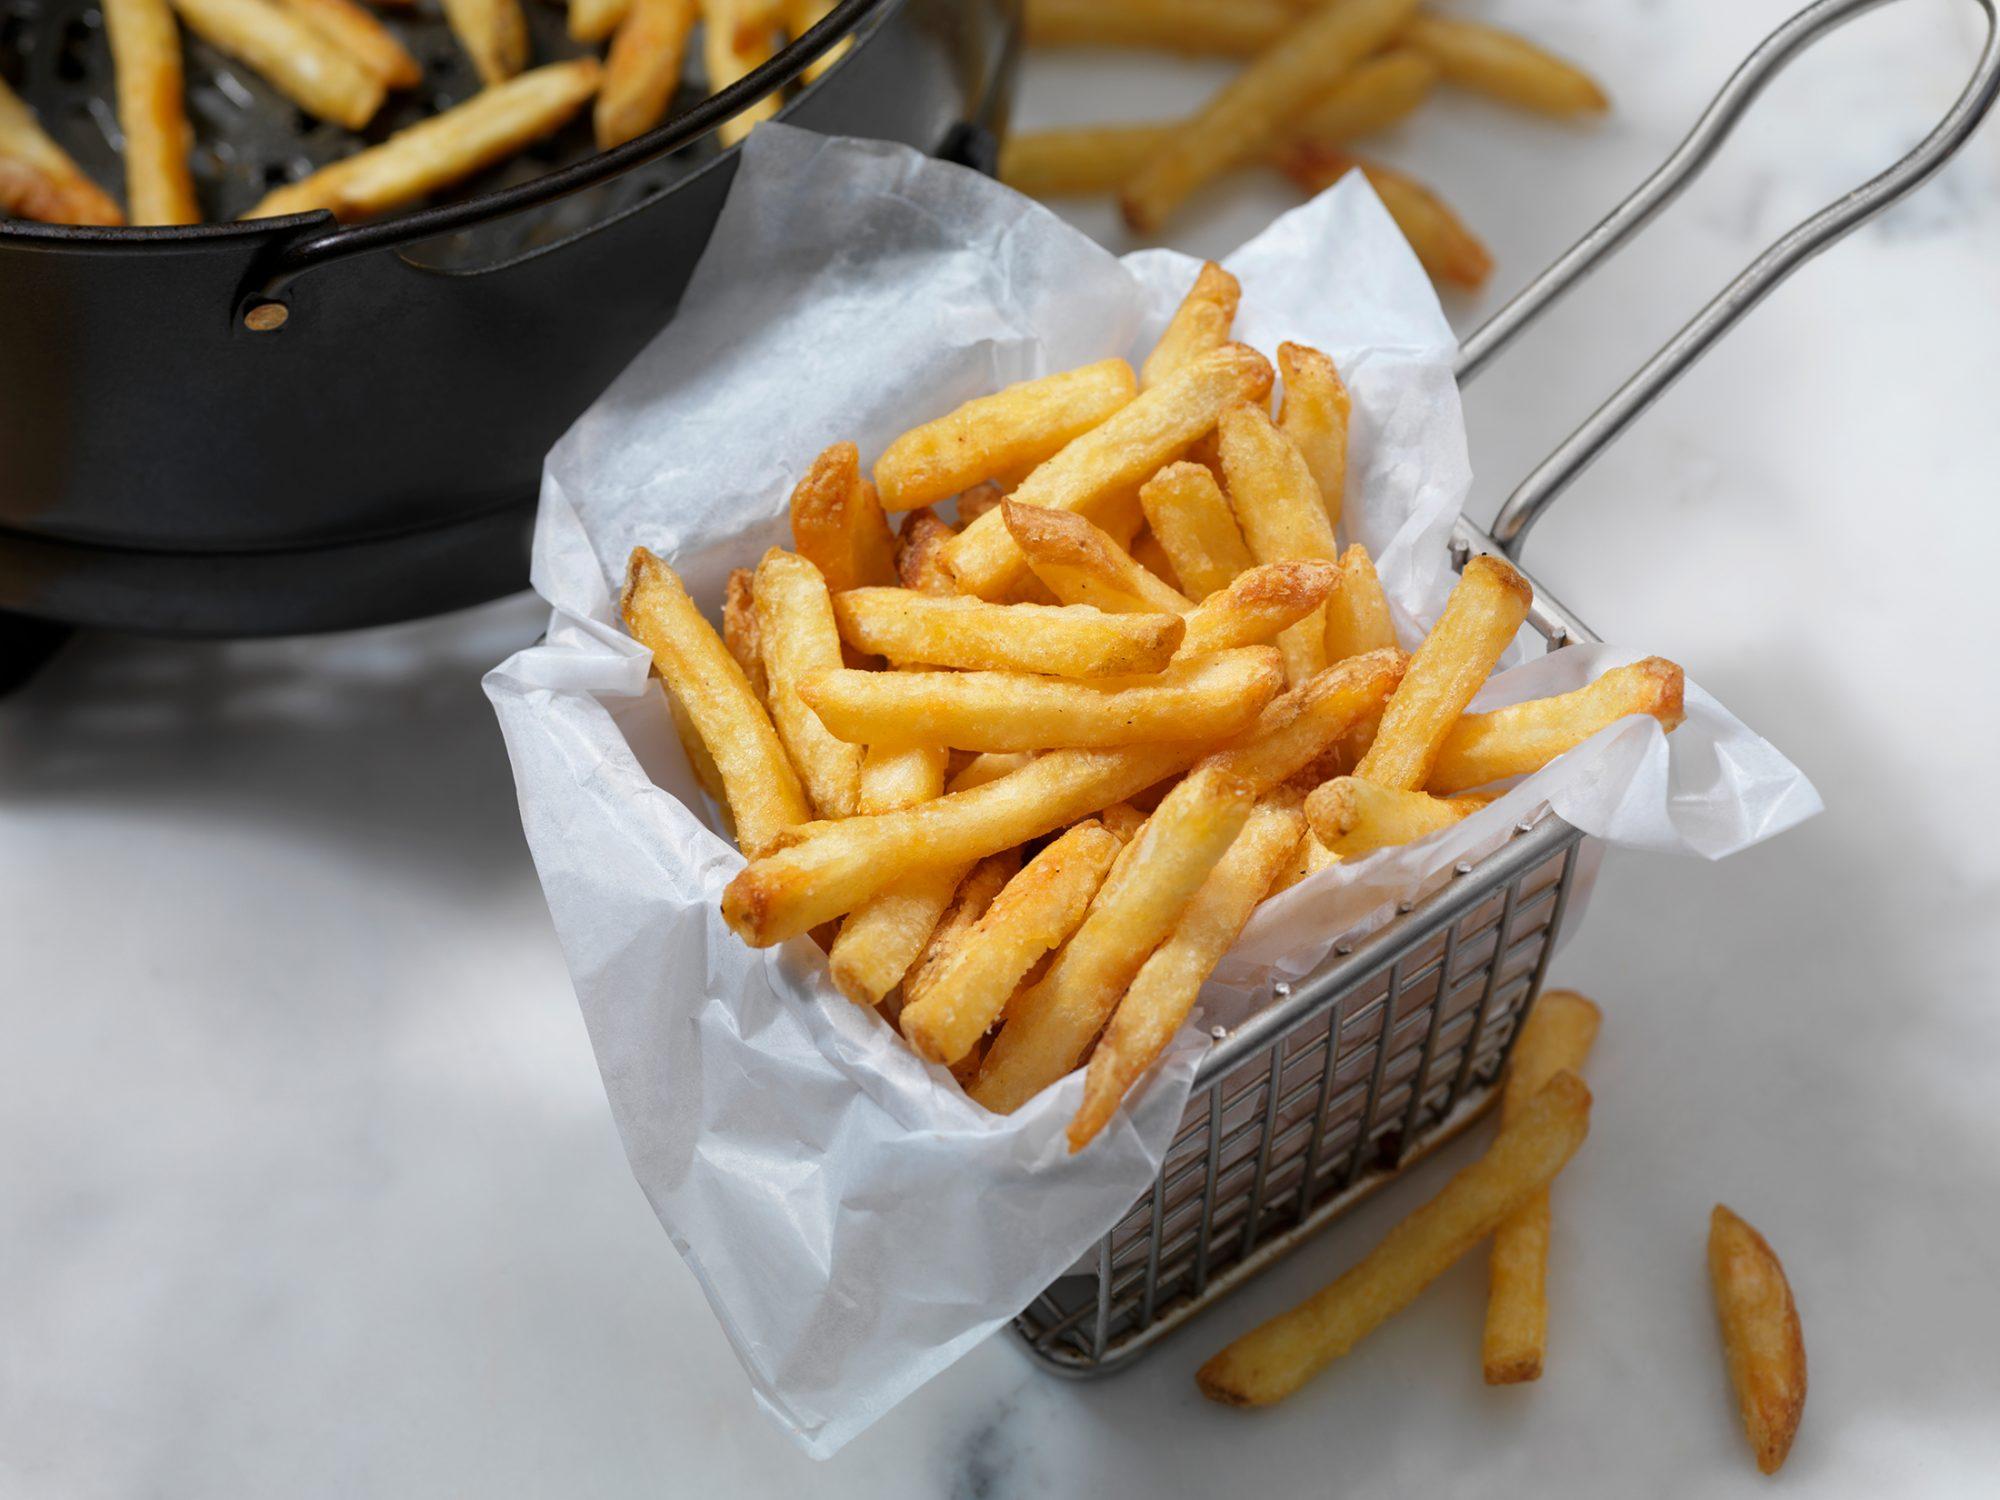 air fryer french fries-1202078726.jpg